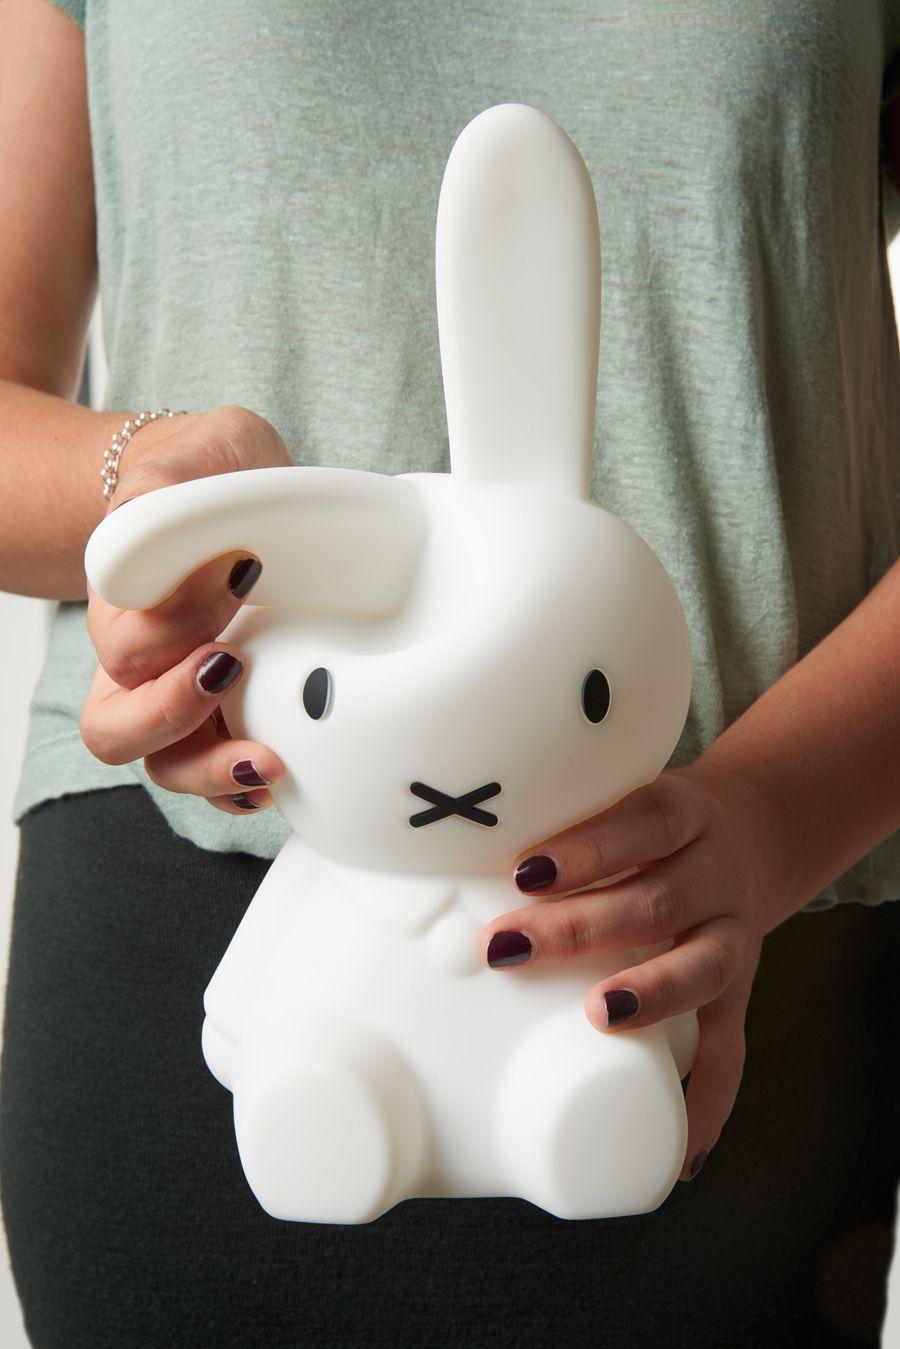 Lampe Veilleuse Lapin Miffy veilleuse design enfant lapin miffy portative. my first